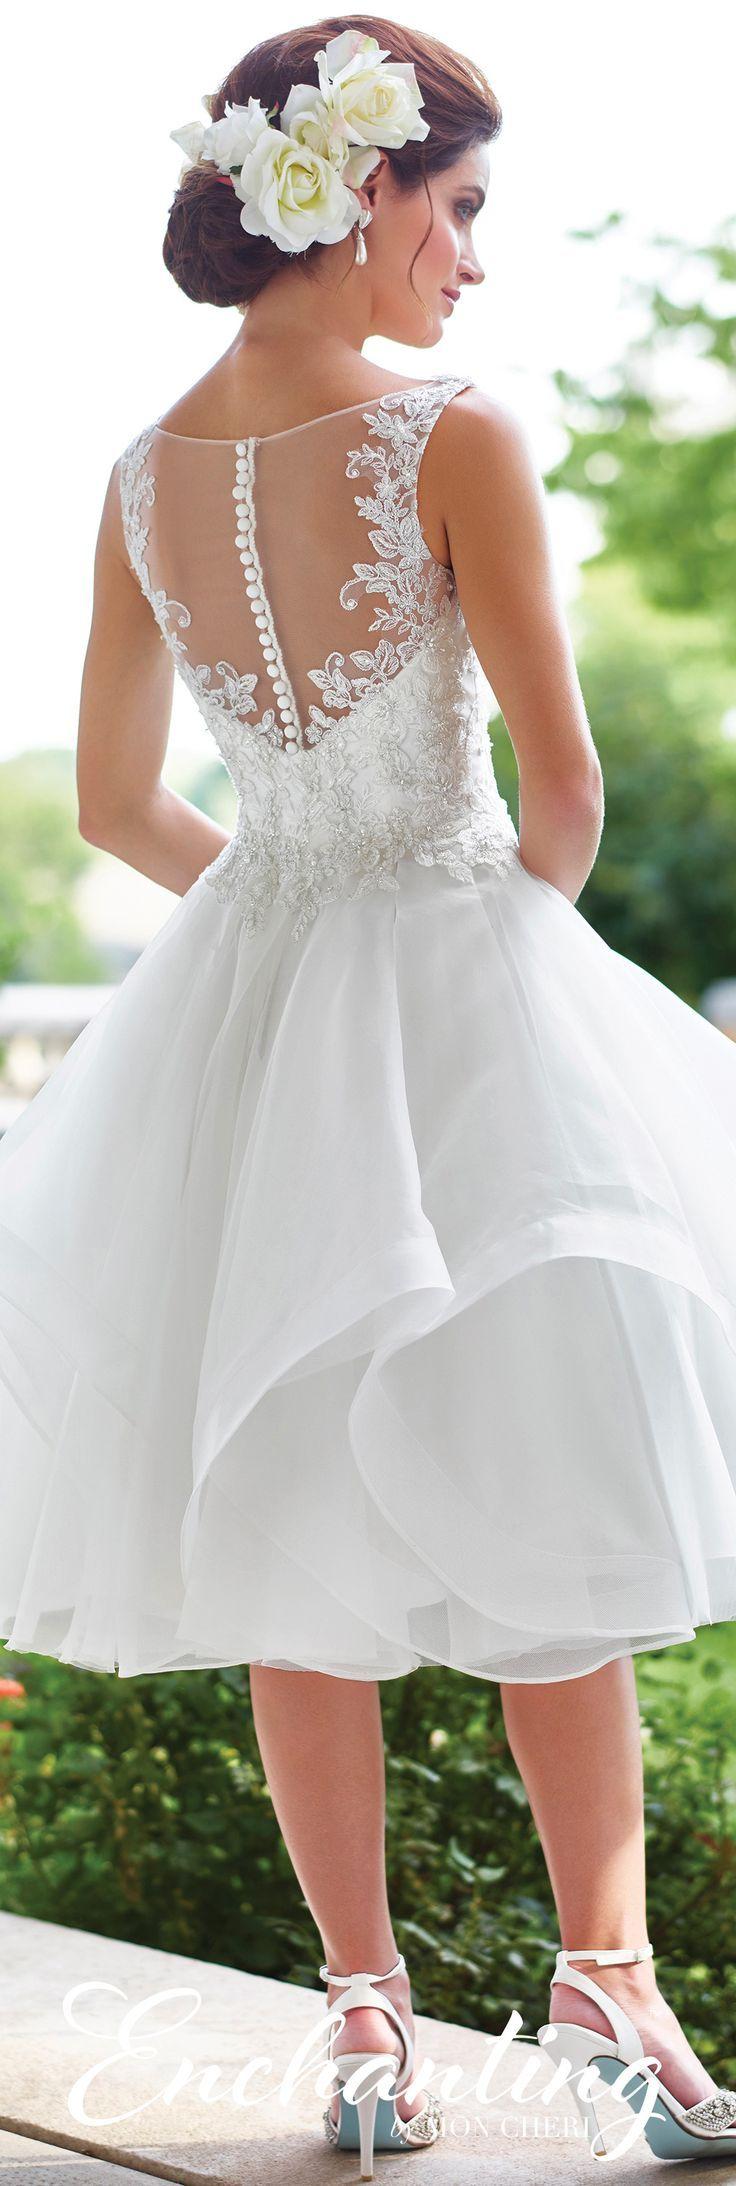 Tulle kneelength wedding dress enchanting by mon cheri